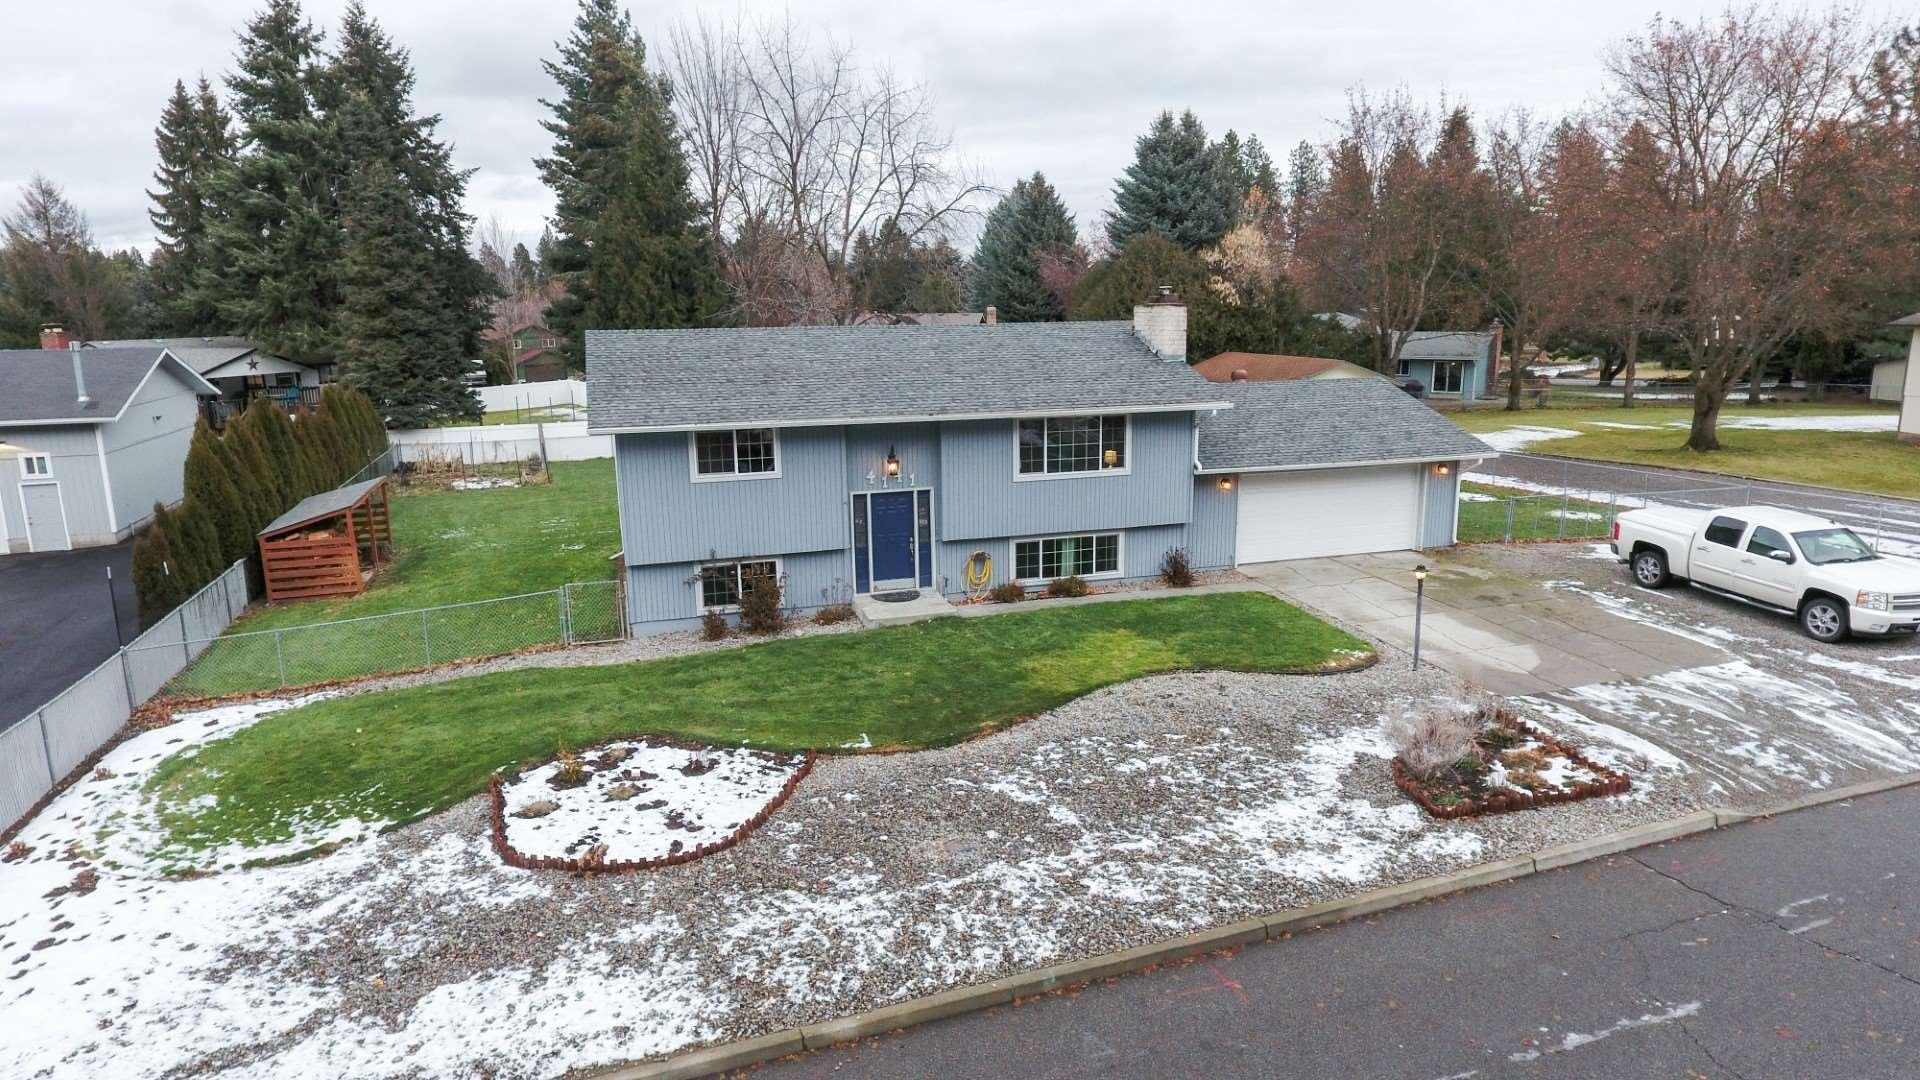 4141 S Sundown Dr, Spokane Valley, WA 99206-9647 - #: 202025869